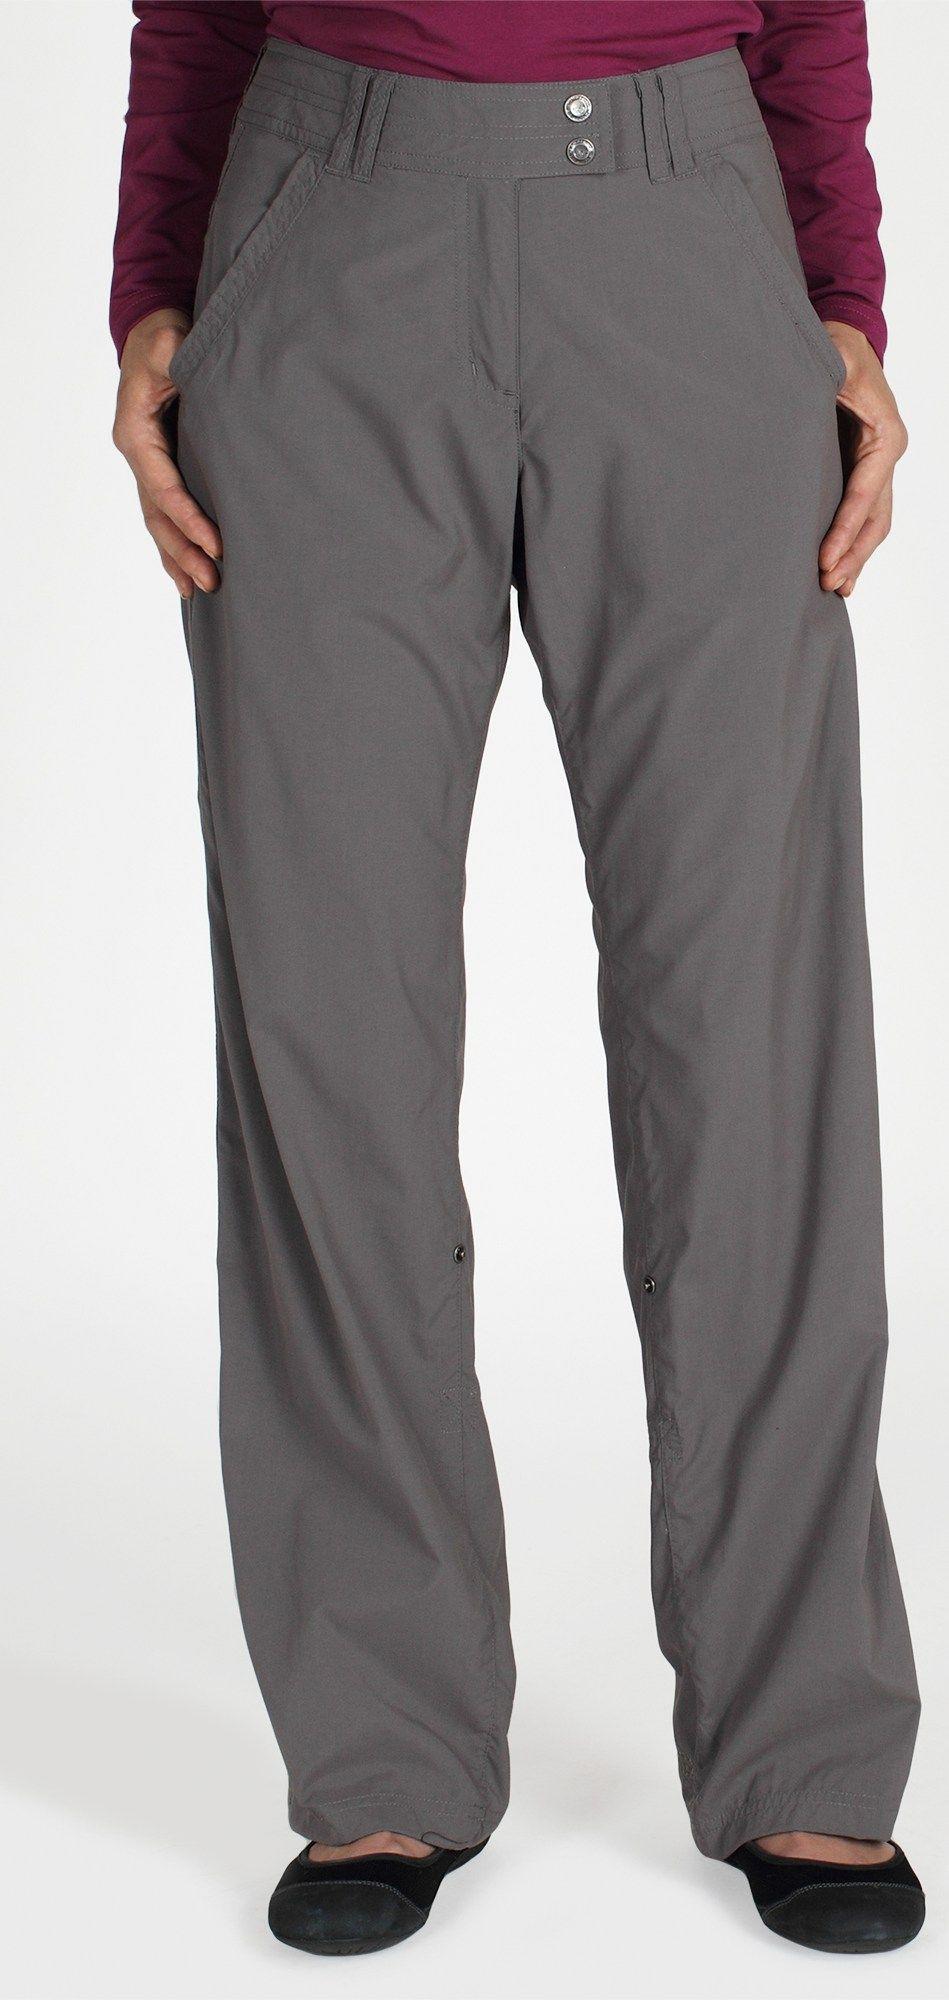 Exofficio Female Nomad Roll-Up Pants - Women's